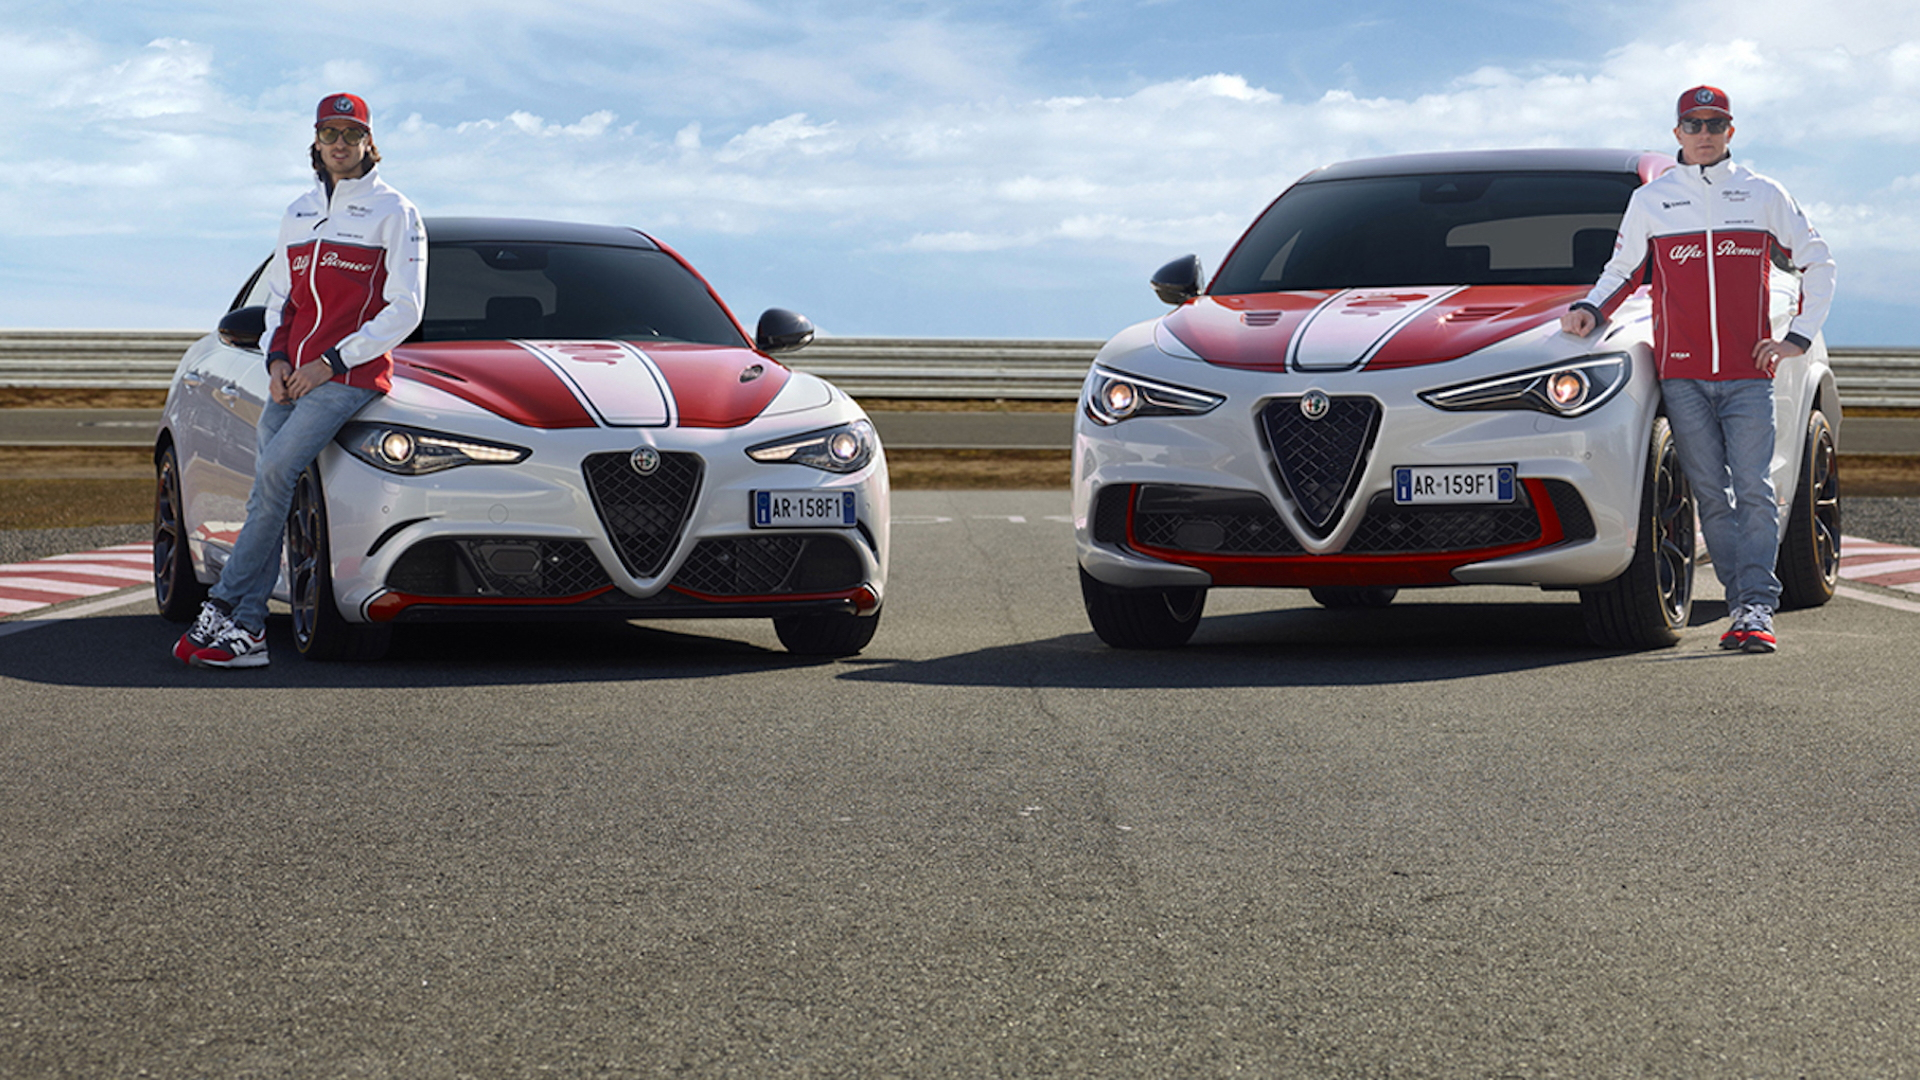 Giulia and Stelvio Quadrifoglio Alfa Romeo Racing limited editions